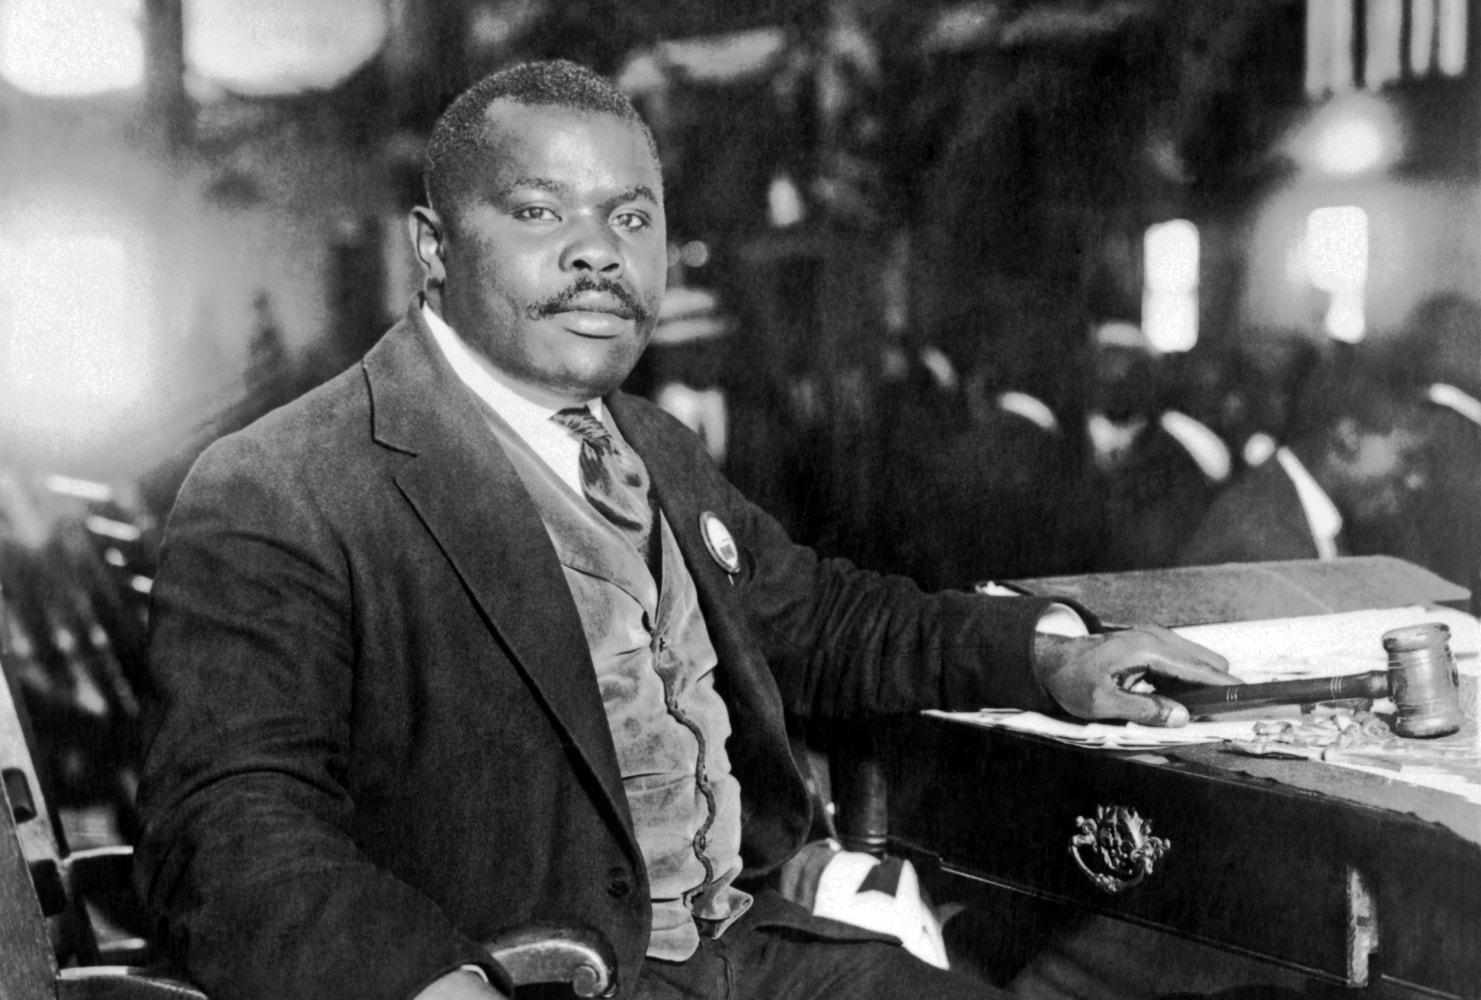 marcus garvey Marcus mosiah garvey (1887 – 1940), sindacalista e scrittore giamaicano citazioni di marcus garvey  i fatti storici una volta scritti haile selassie di abissinia.